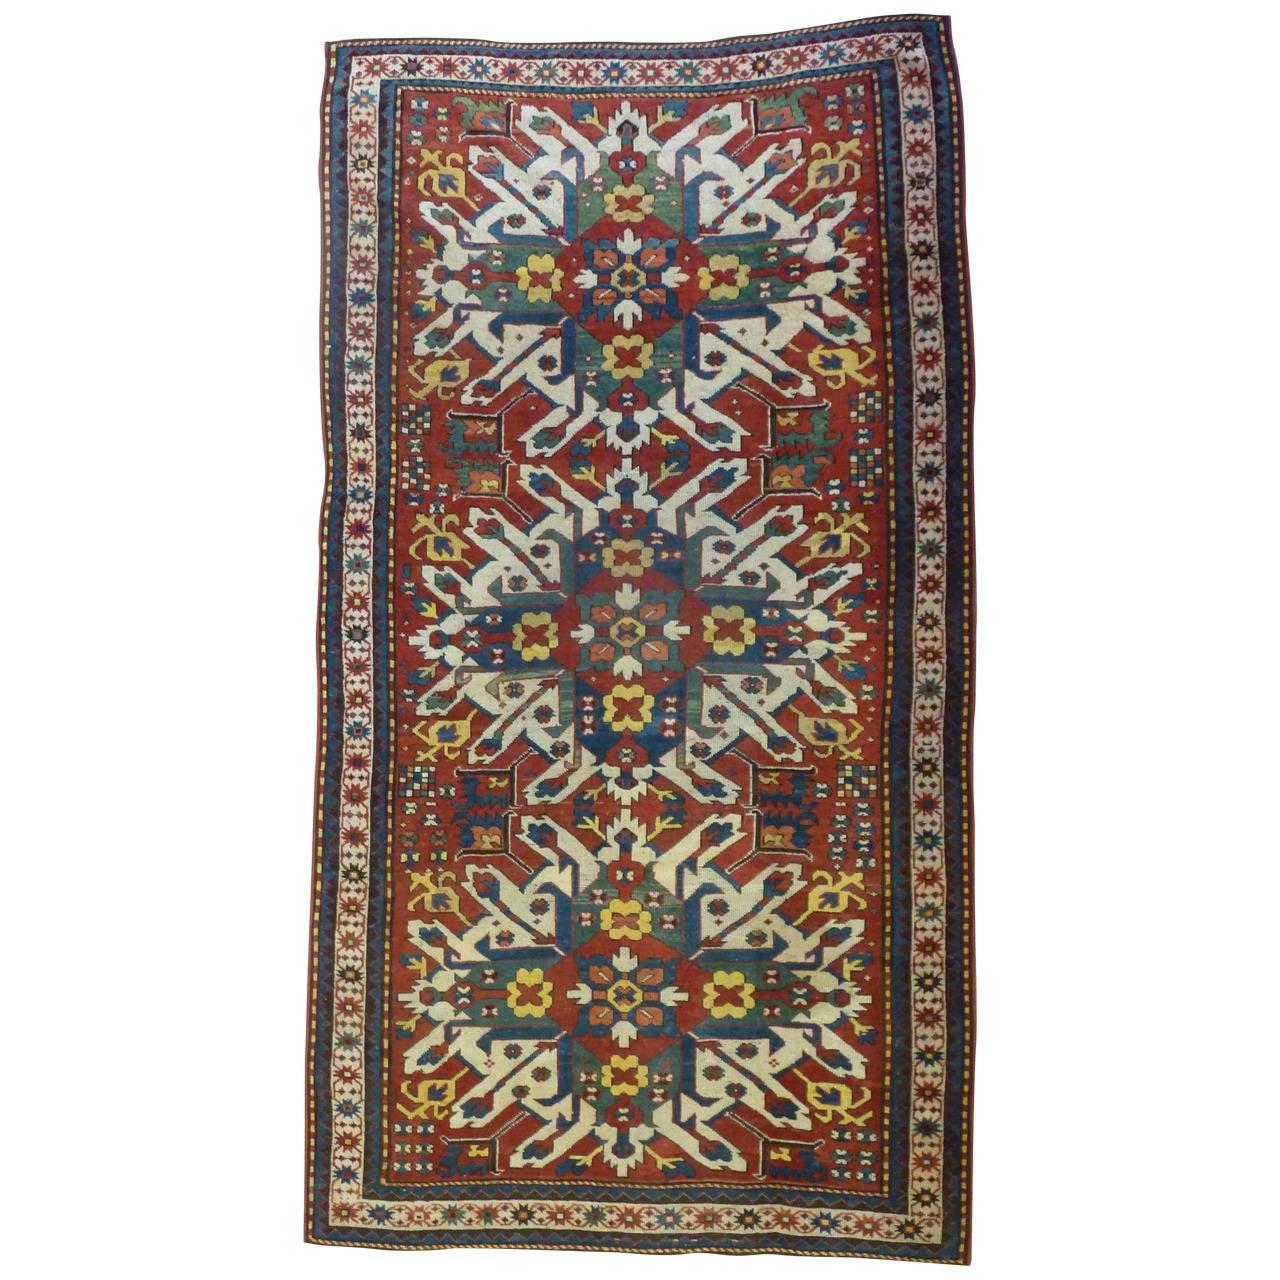 Armenian Antique Rugs: Antique Eagle Kazak Rug At 1stdibs